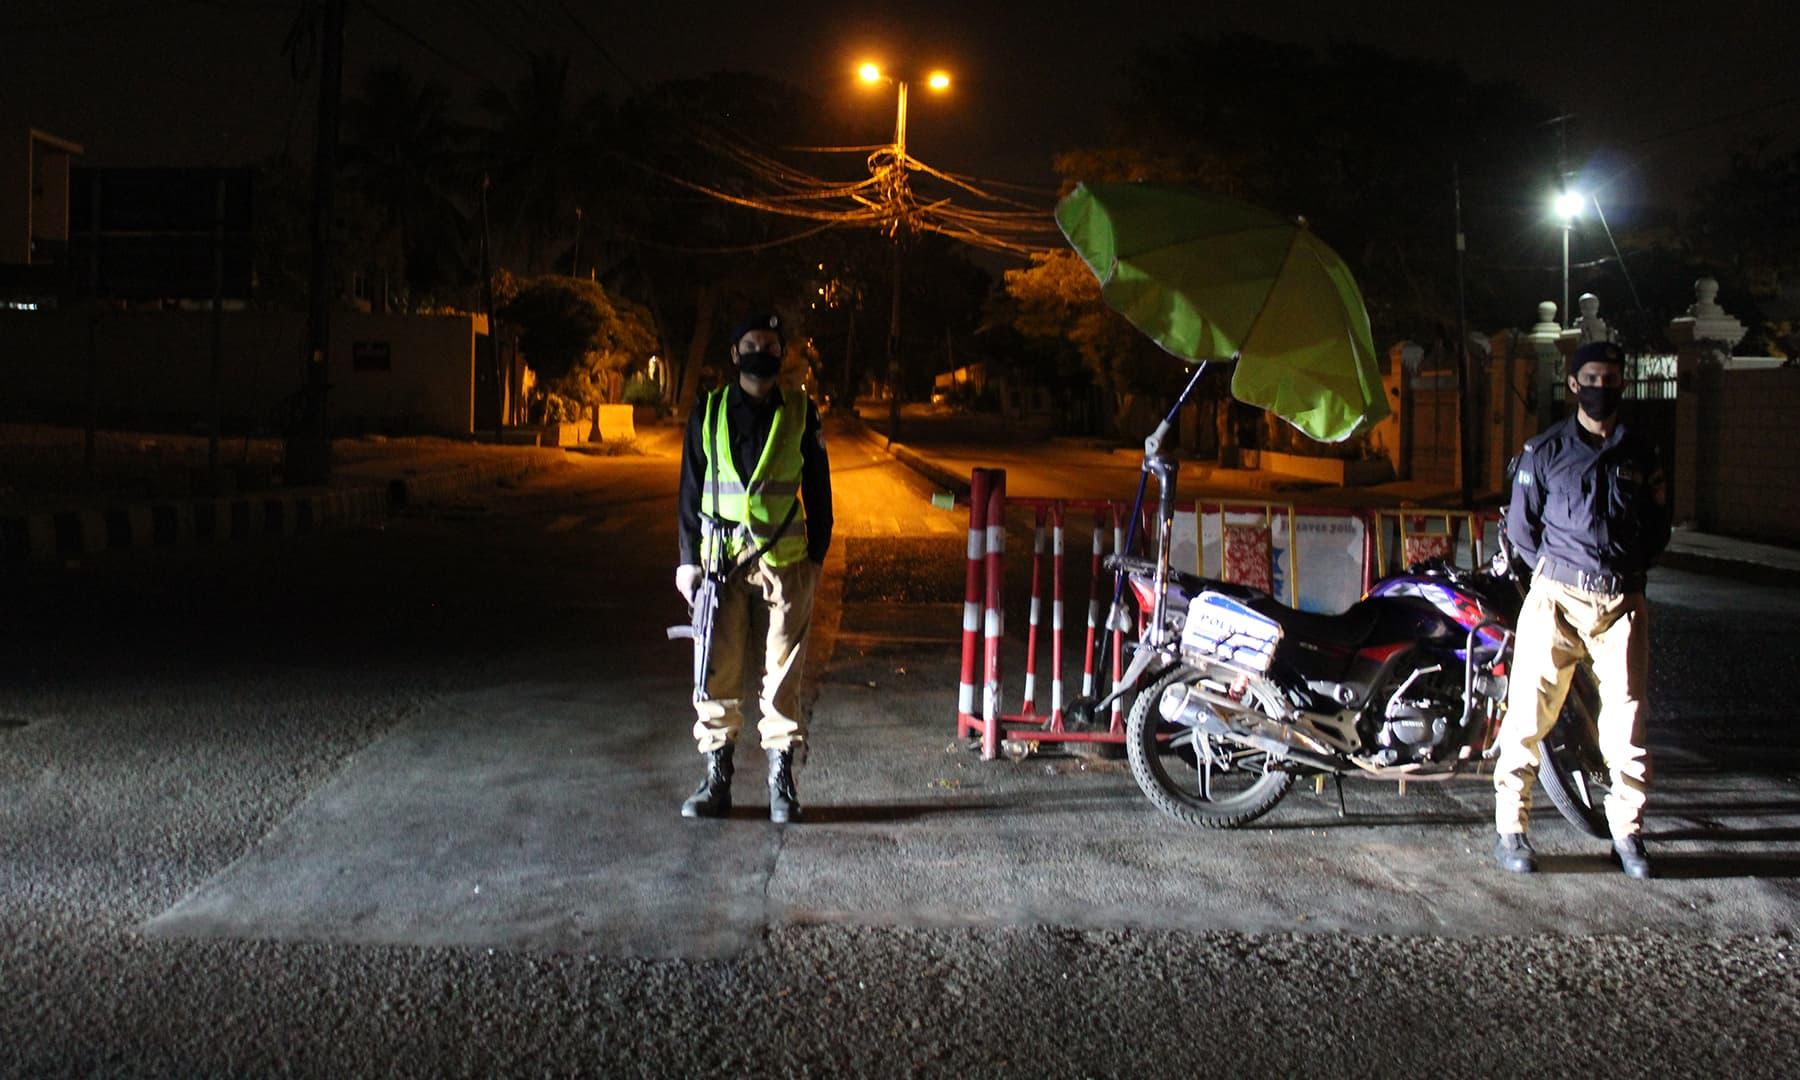 Policemen wearing masks stand guard at an empty street in Karachi.